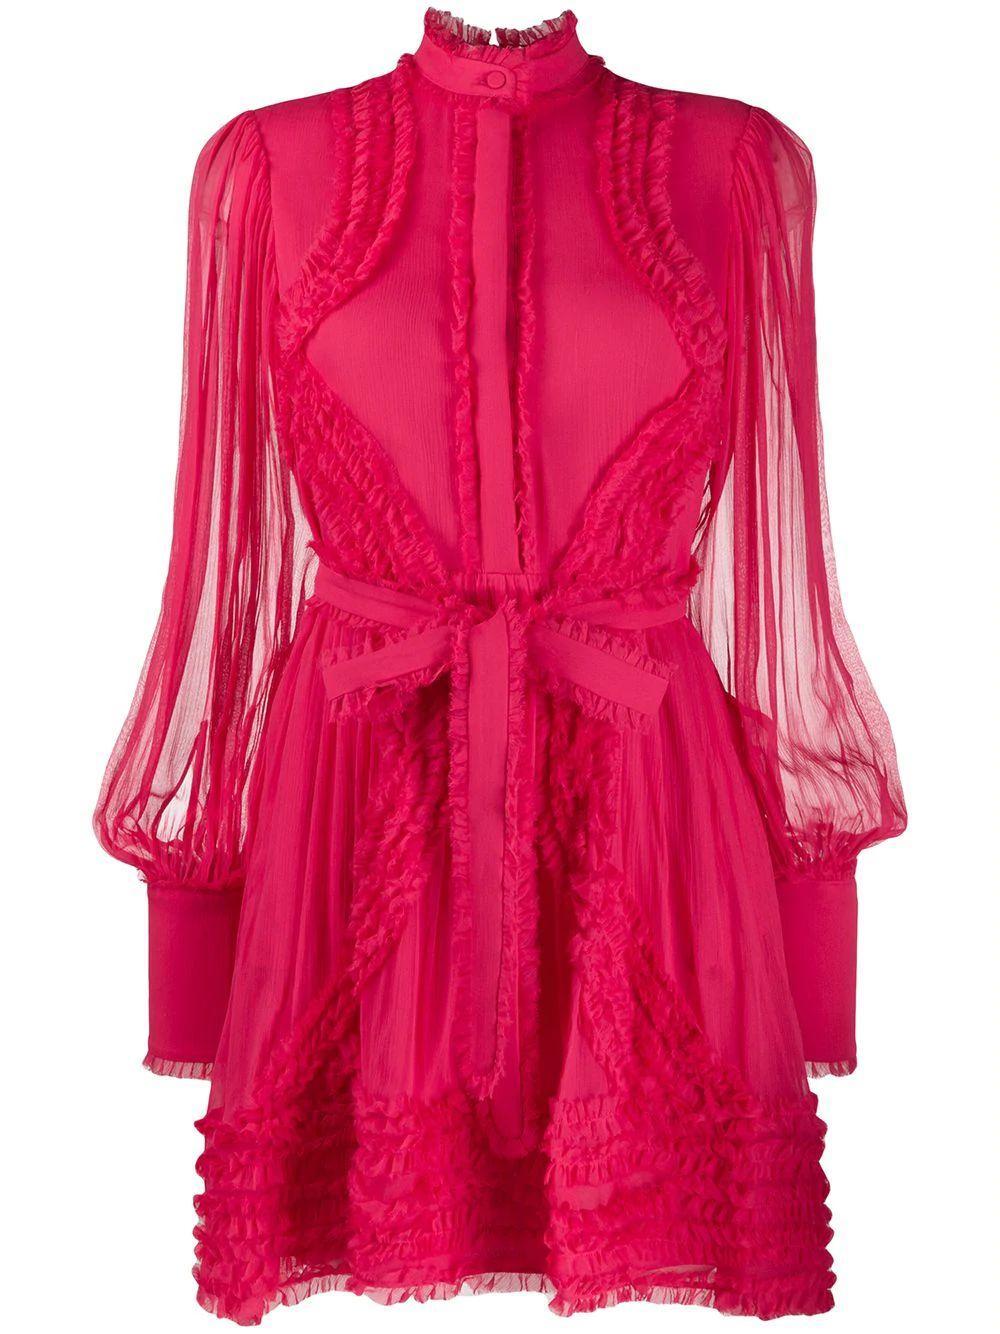 Olinka Long Sleeve Ruffle Dress Item # A4190310-5760